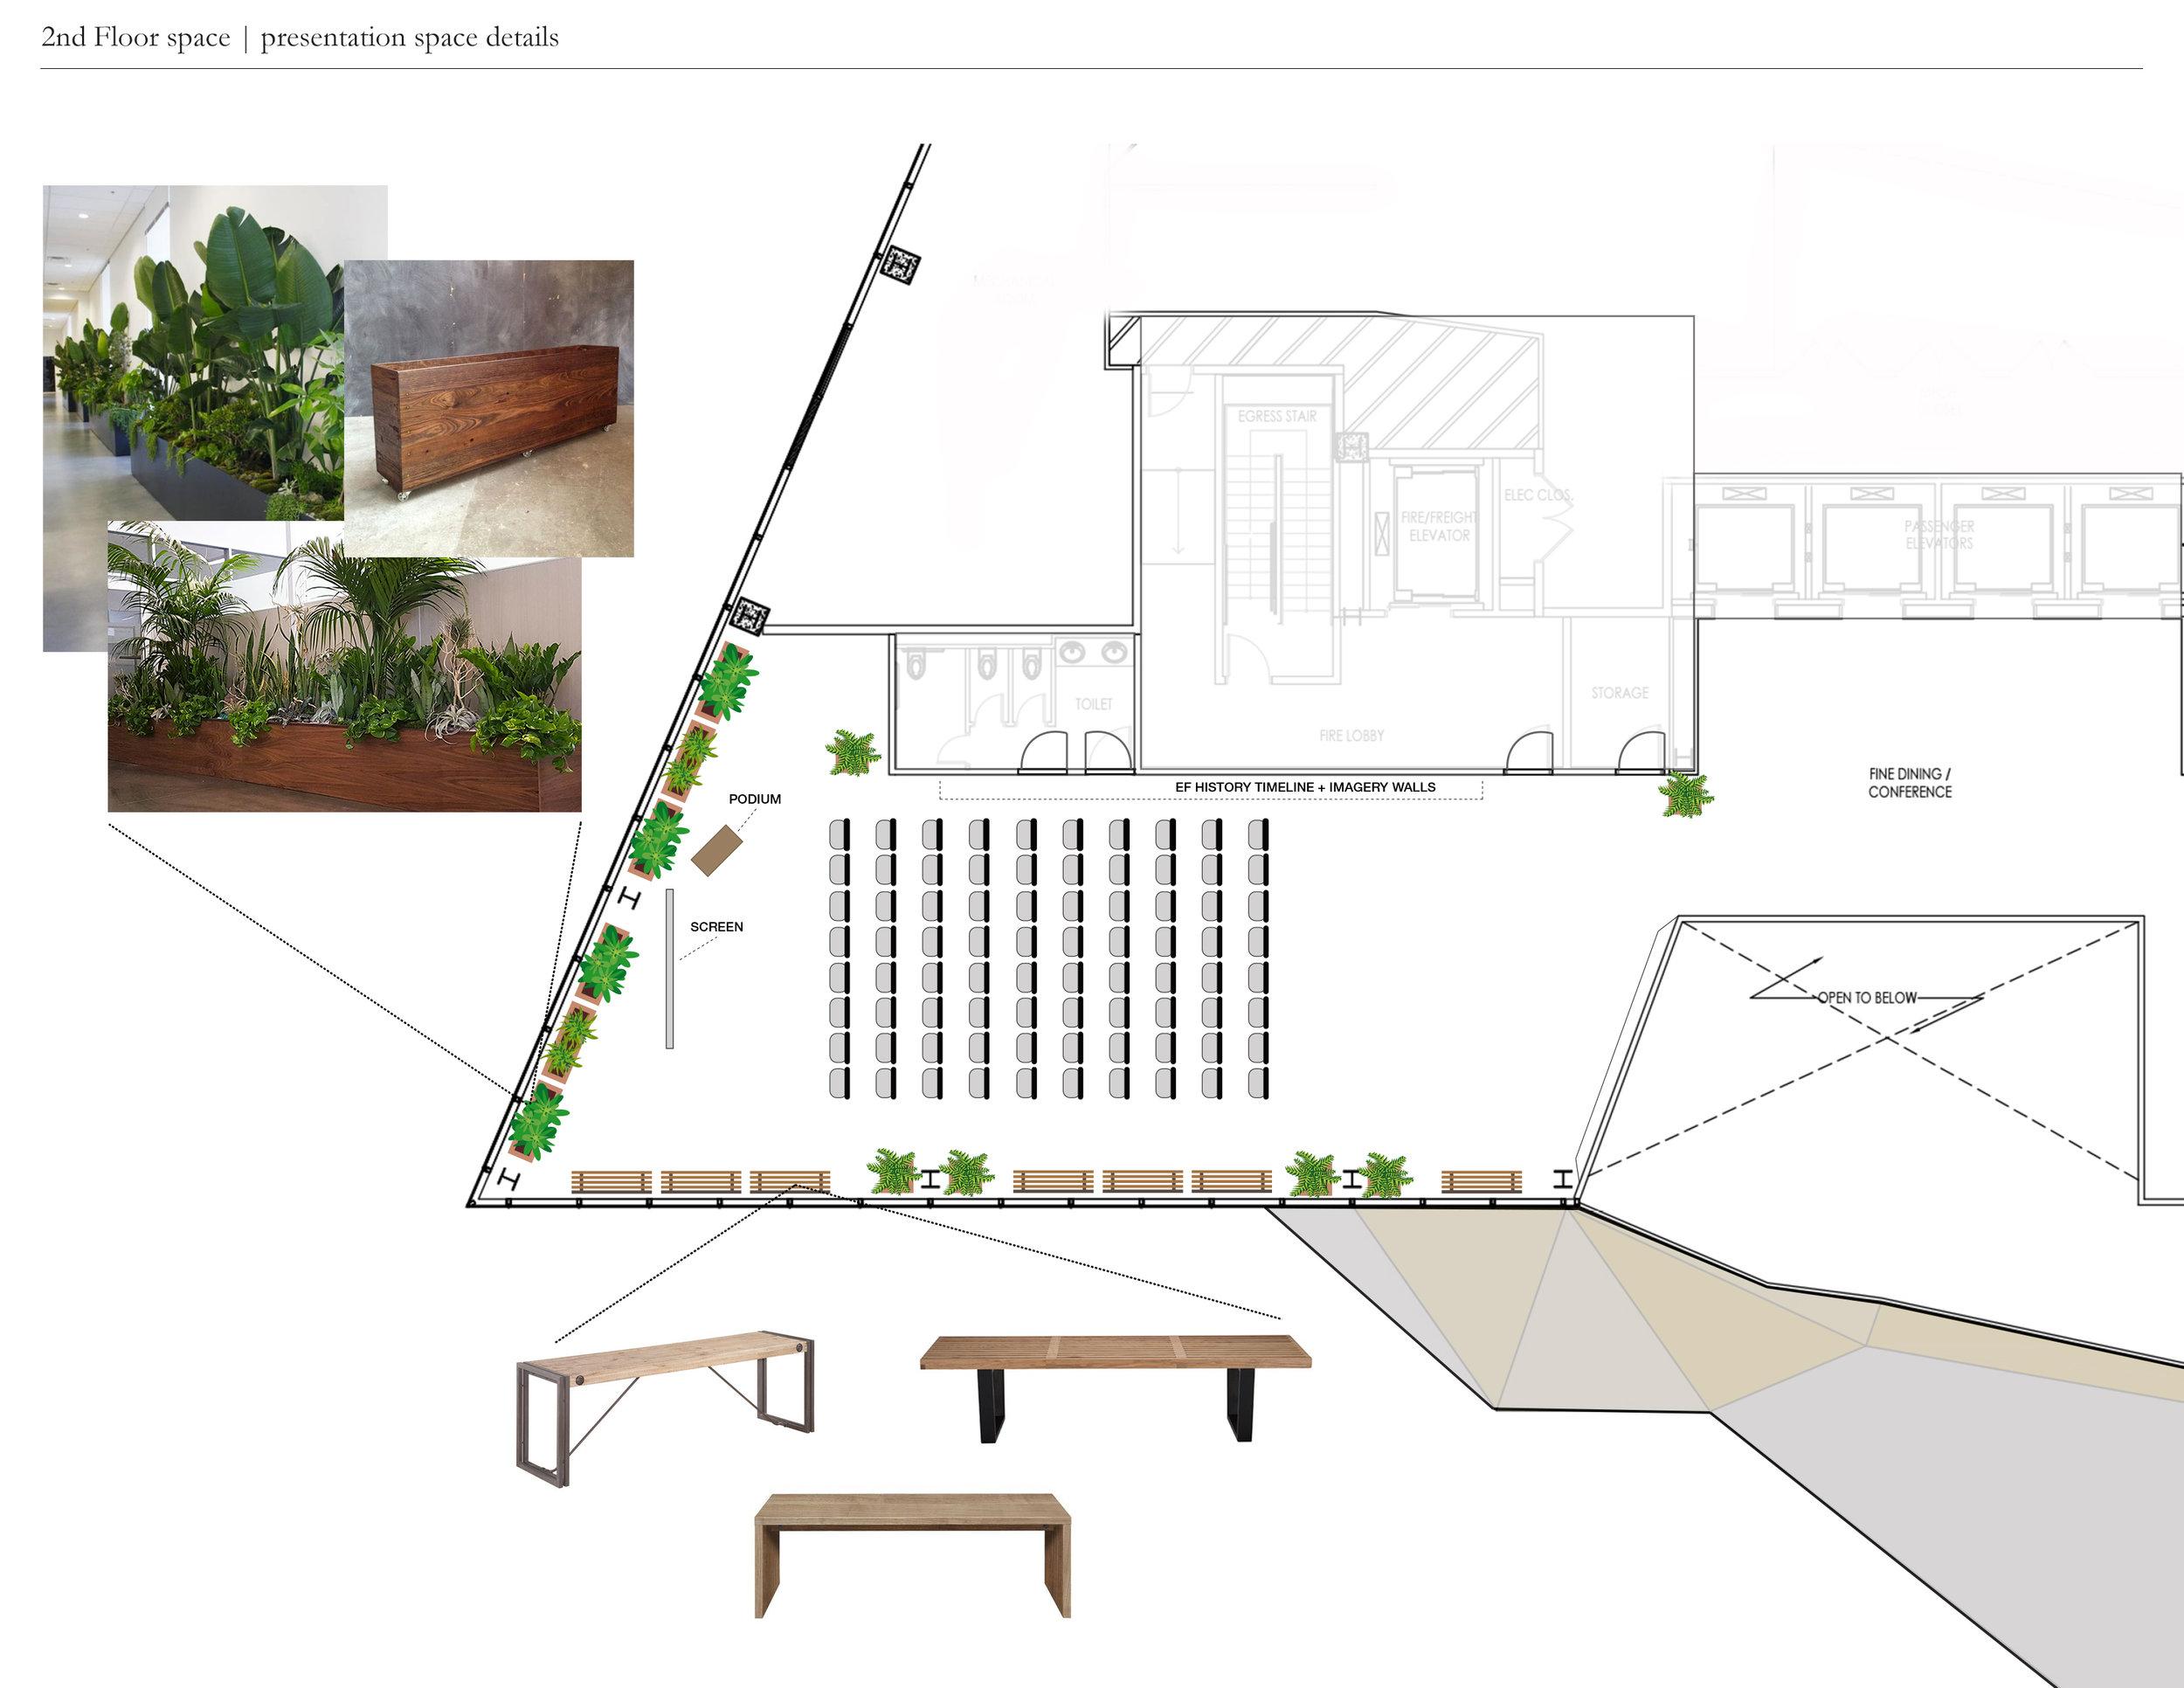 PresentationSpace-Plan.jpg